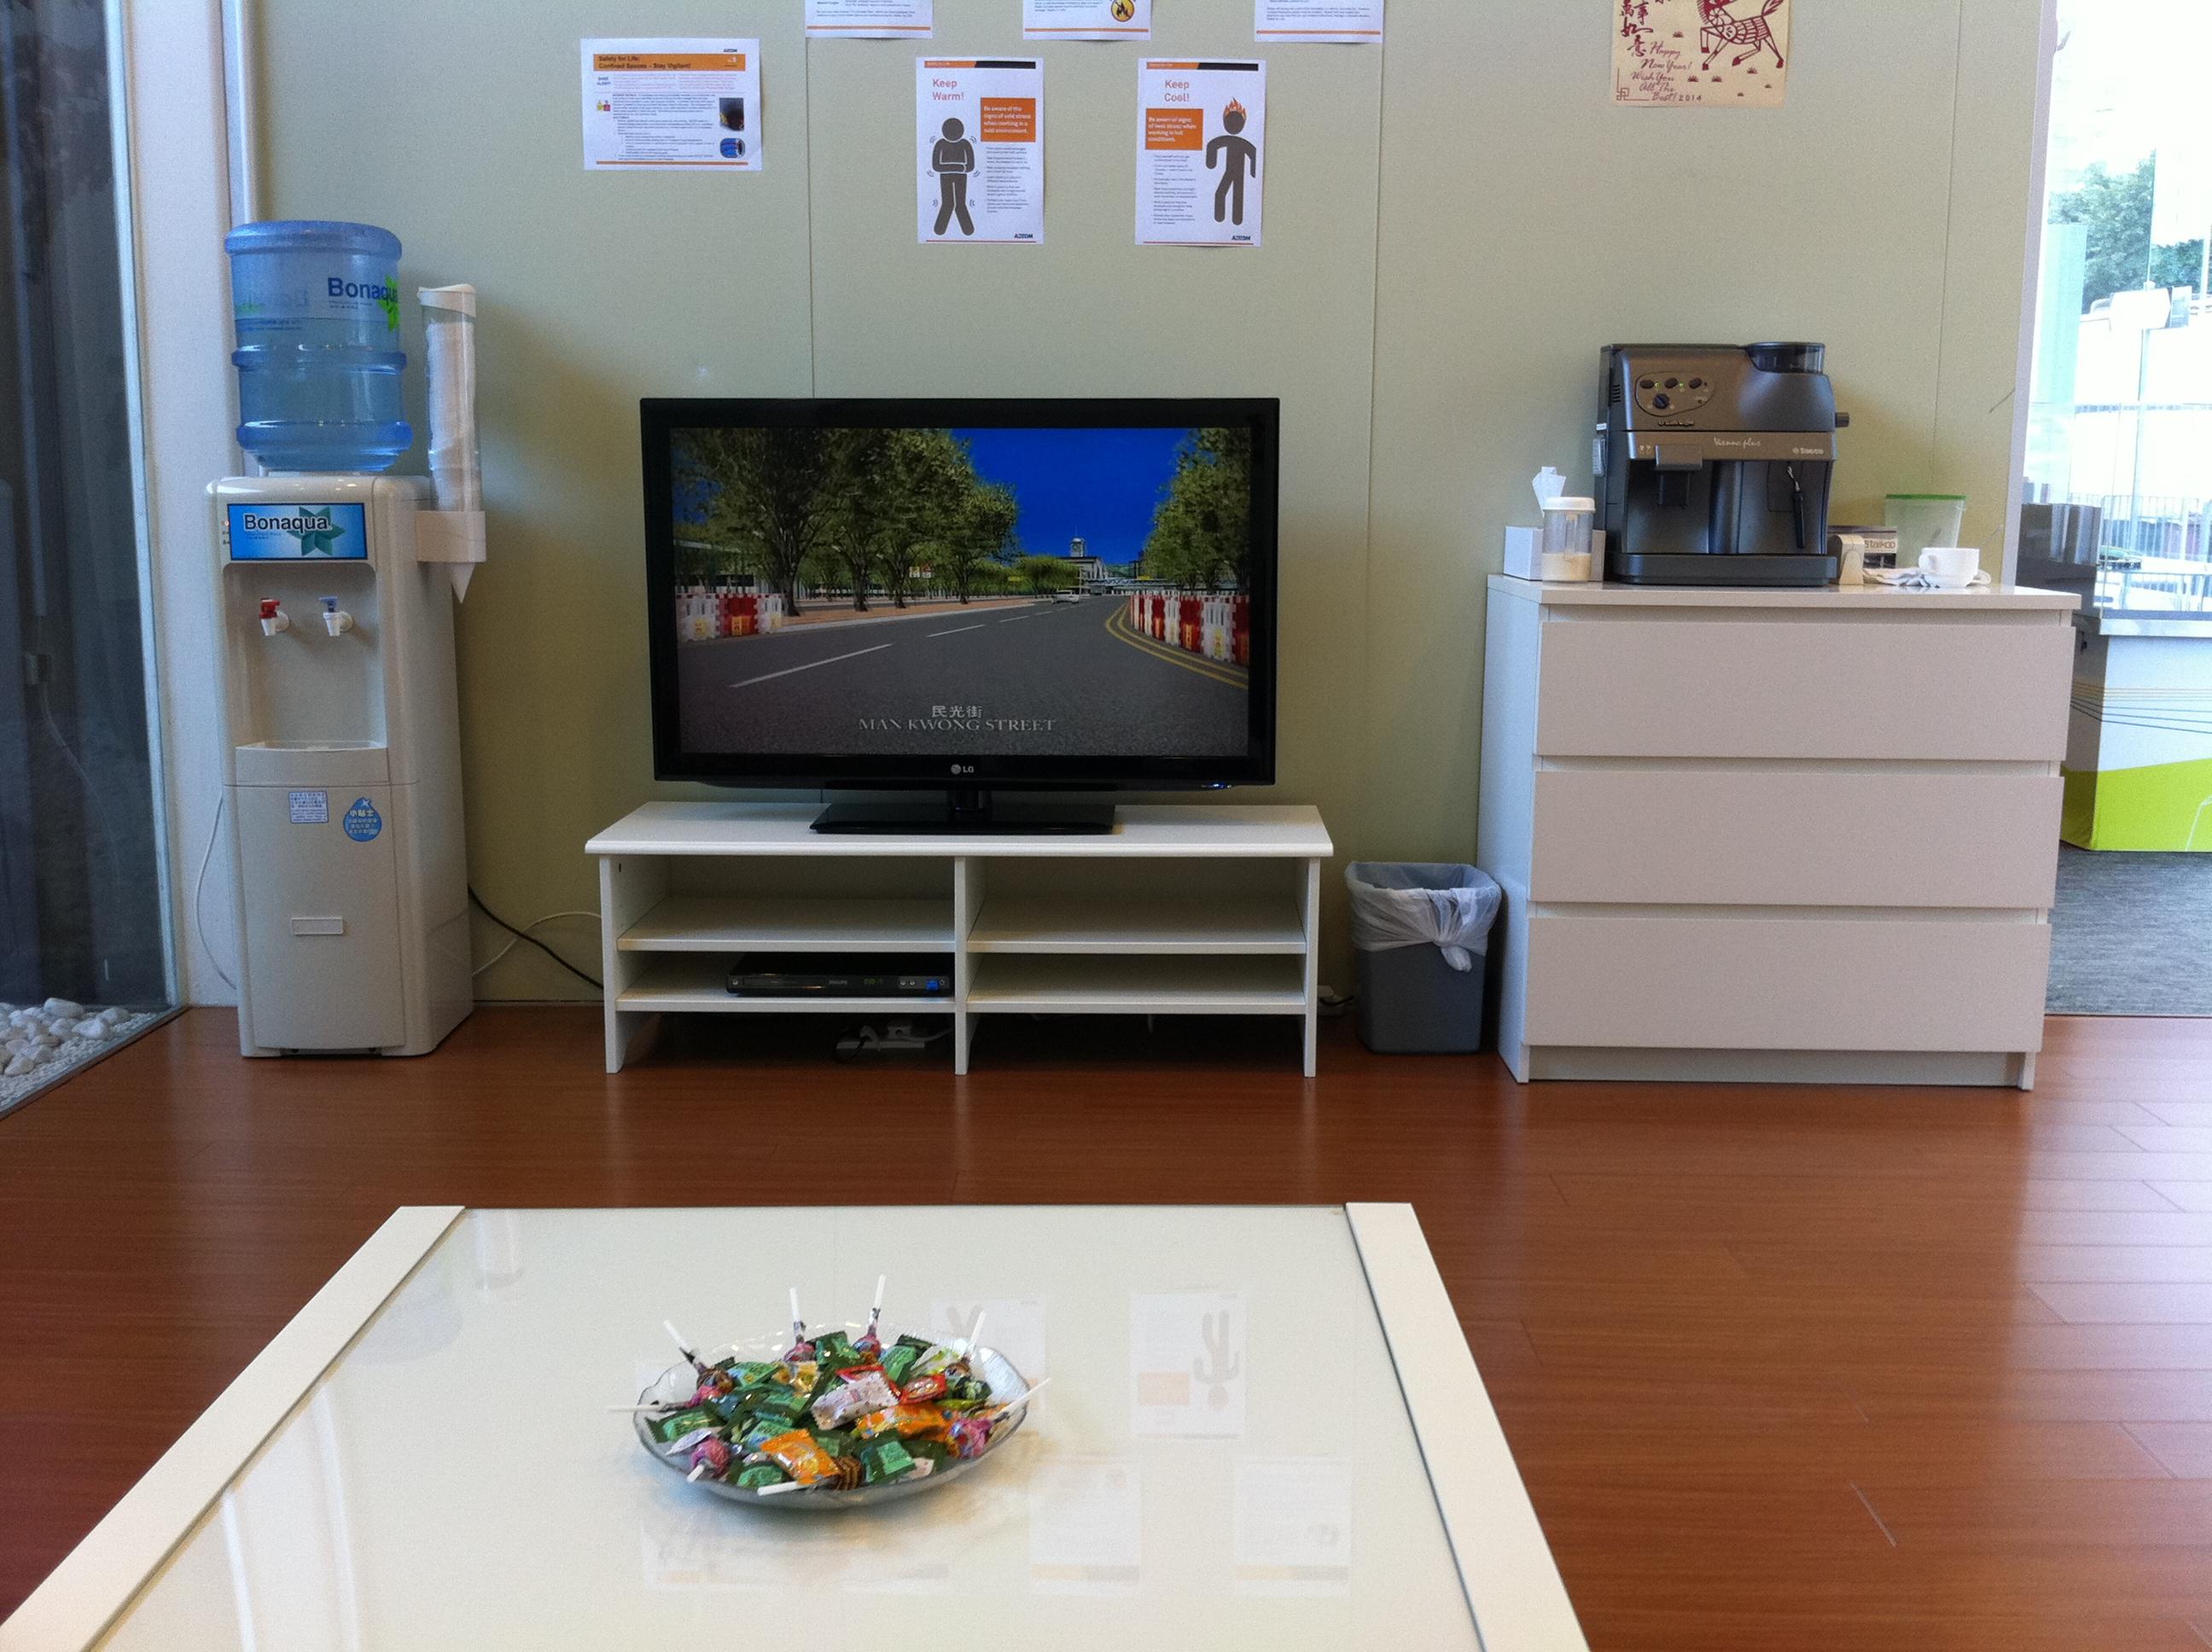 What Size Tv For Living Room Filehk 中環 Central 民耀街 Man Yiu Street 中環社區聯絡中心